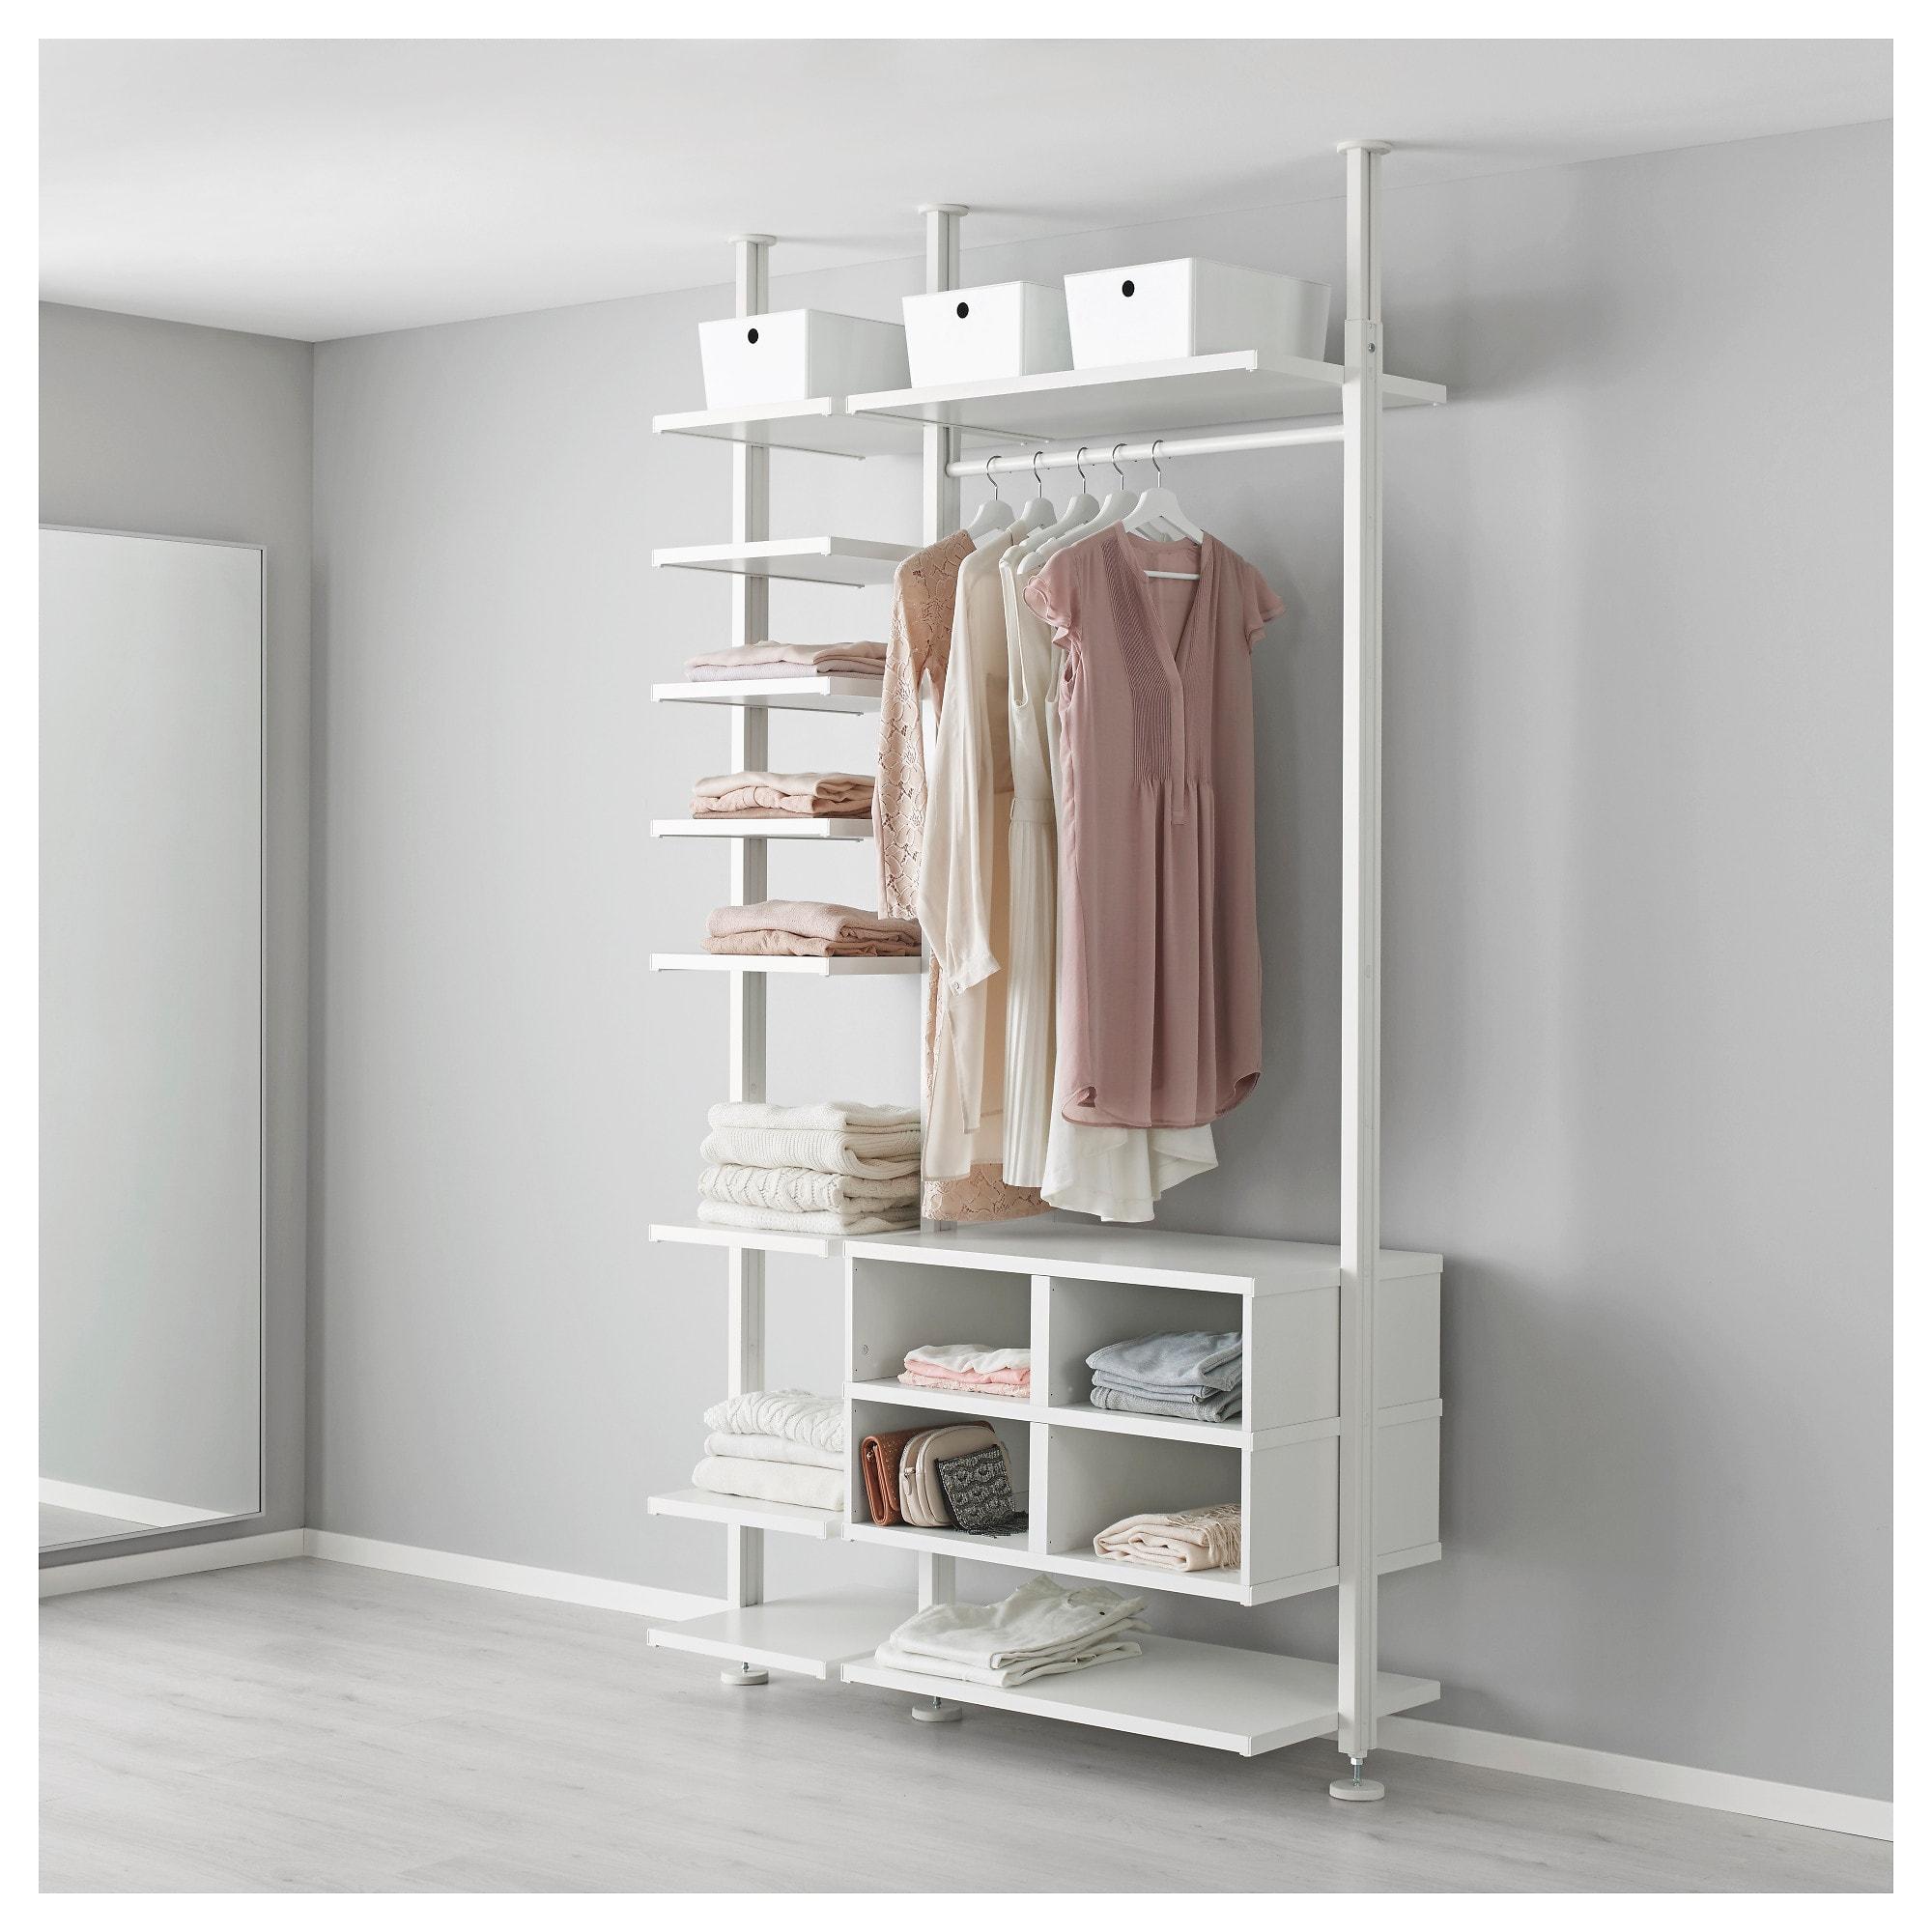 2 секции ЭЛВАРЛИ белый артикуль № 192.039.79 в наличии. Онлайн каталог IKEA Беларусь. Быстрая доставка и соборка.